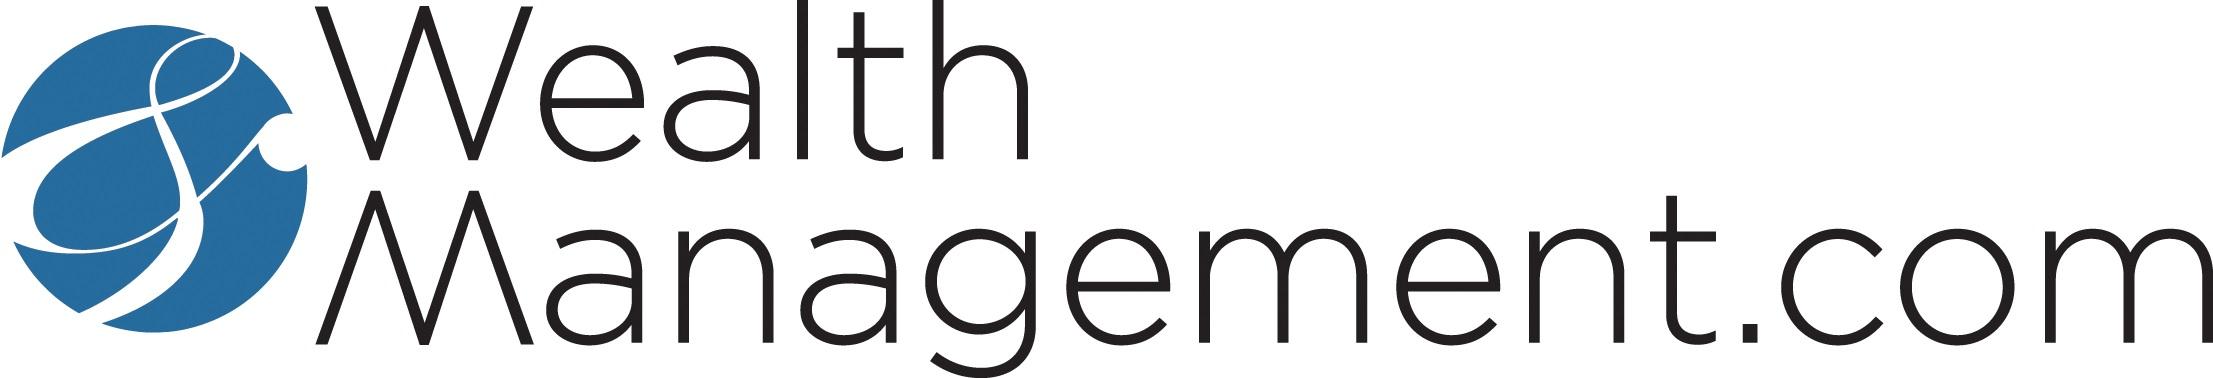 WealthManagement.com logo